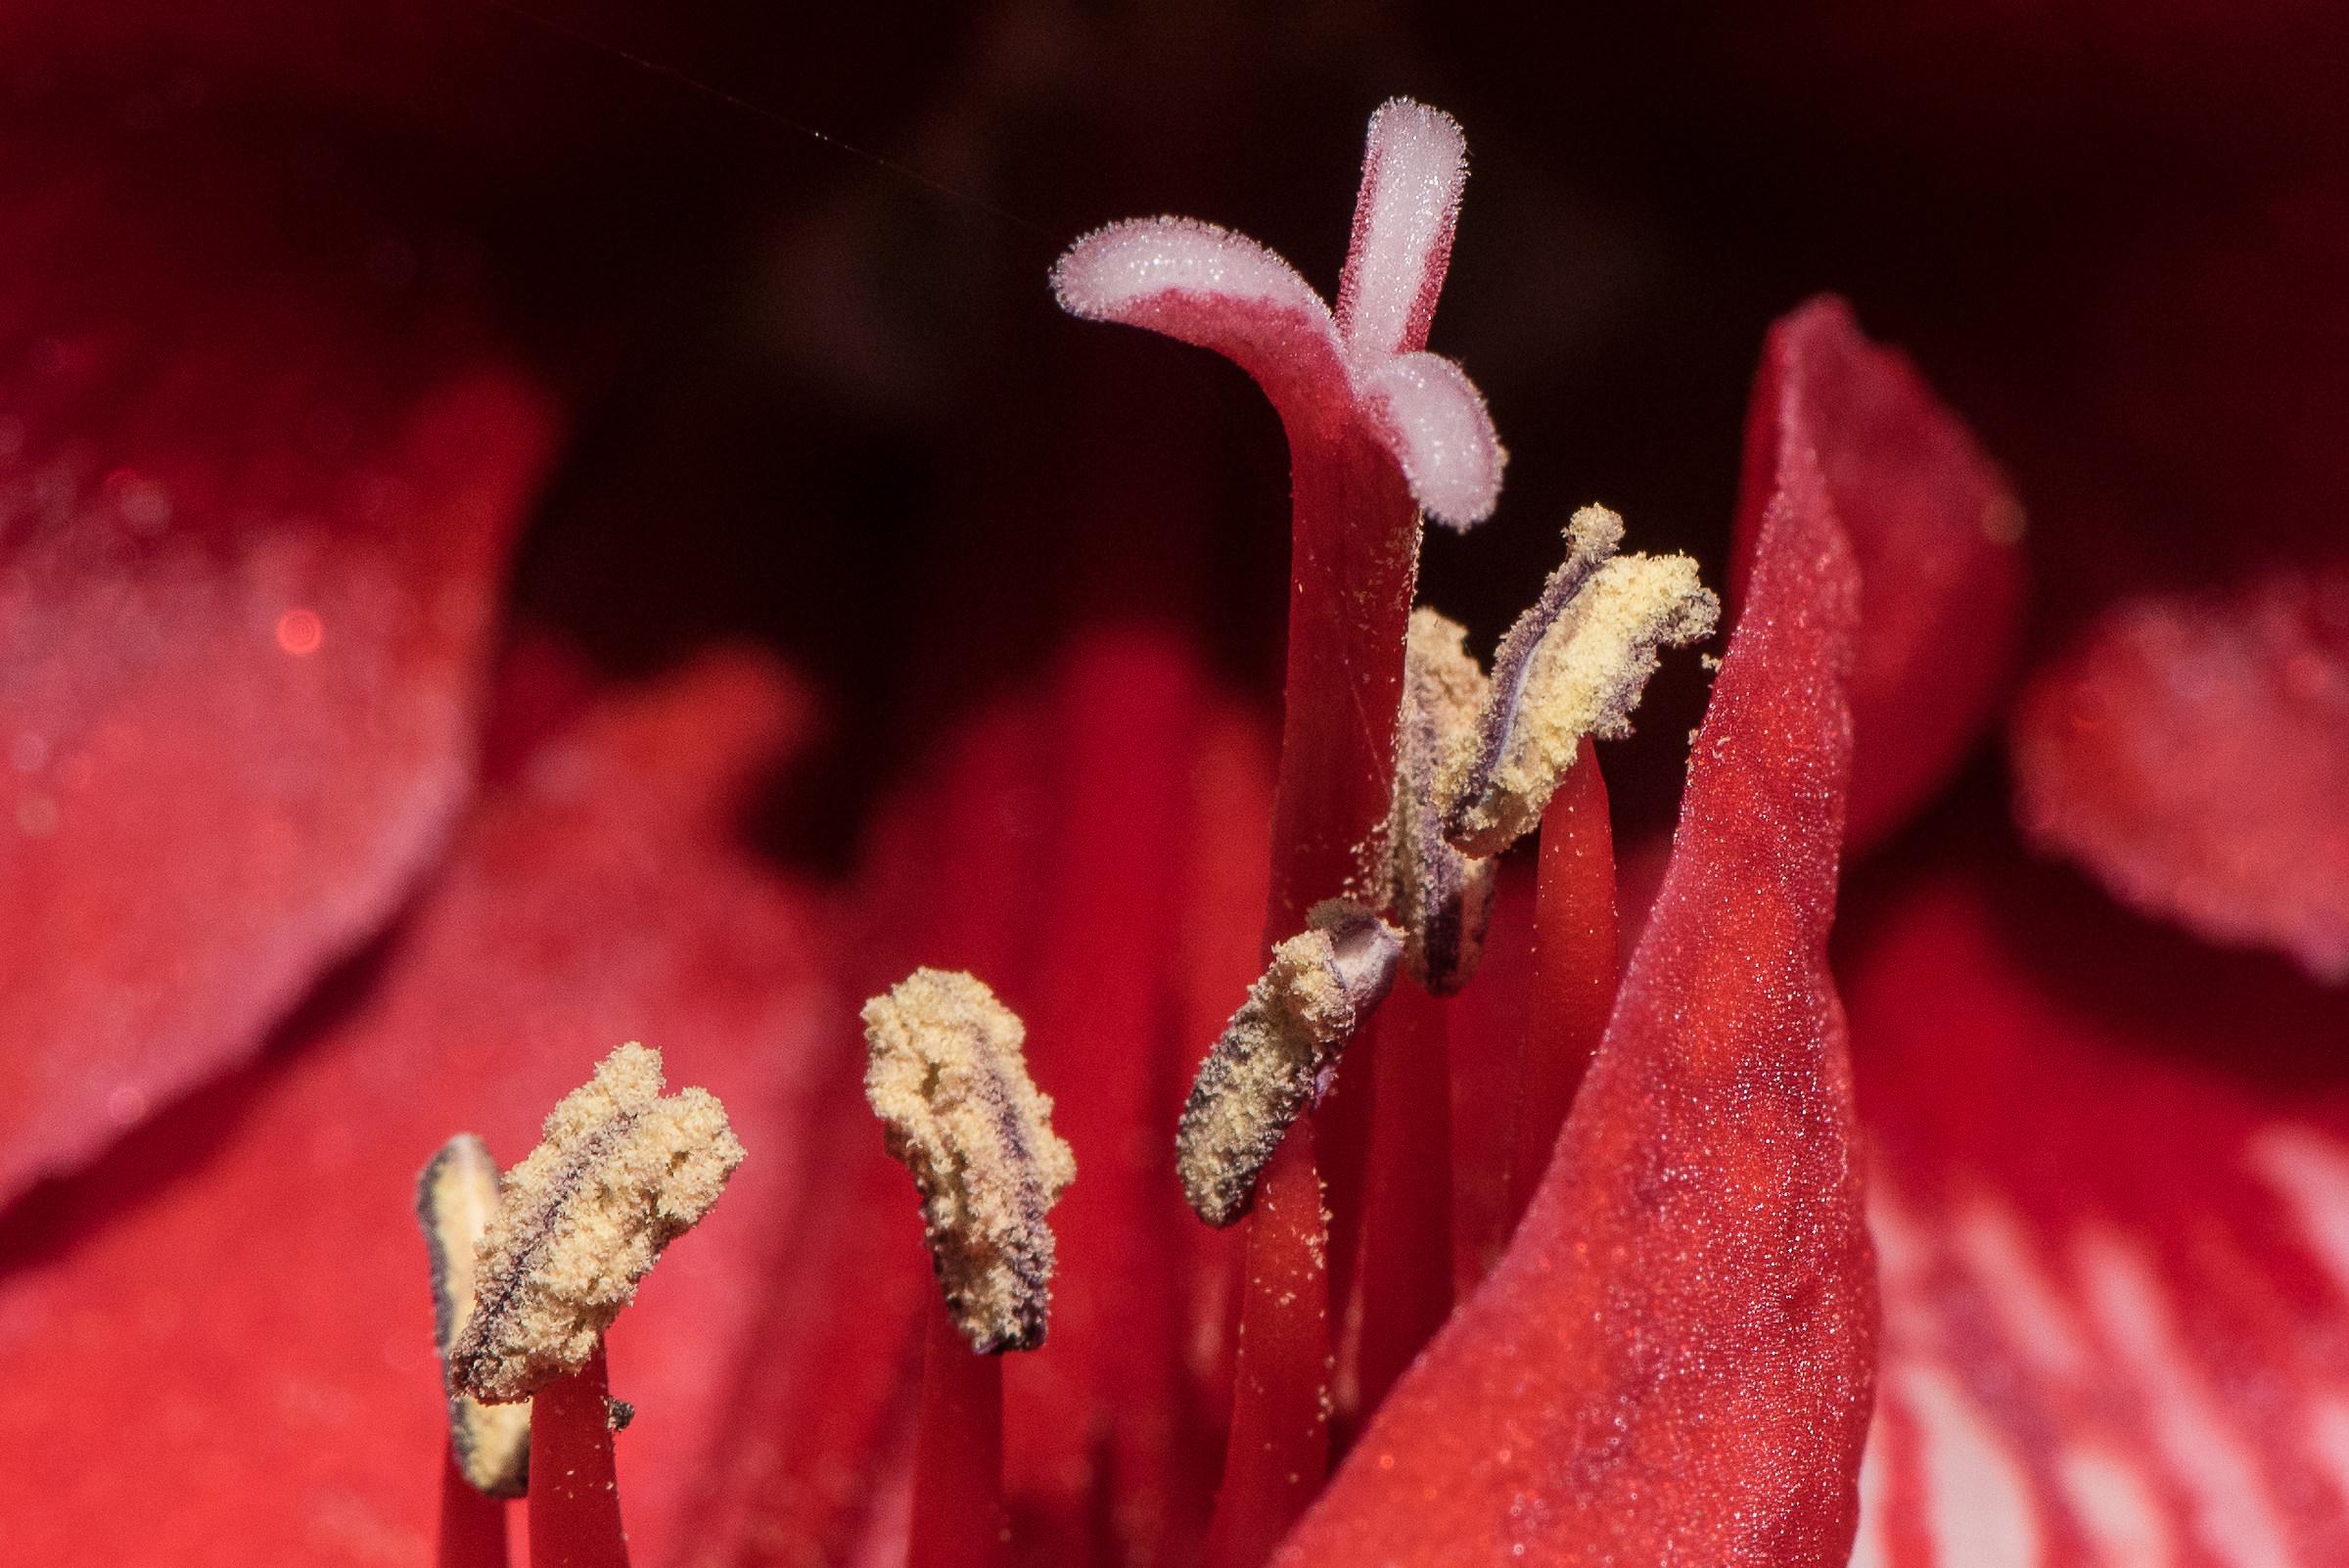 Amarillo, inside, pollen ready to disperse...